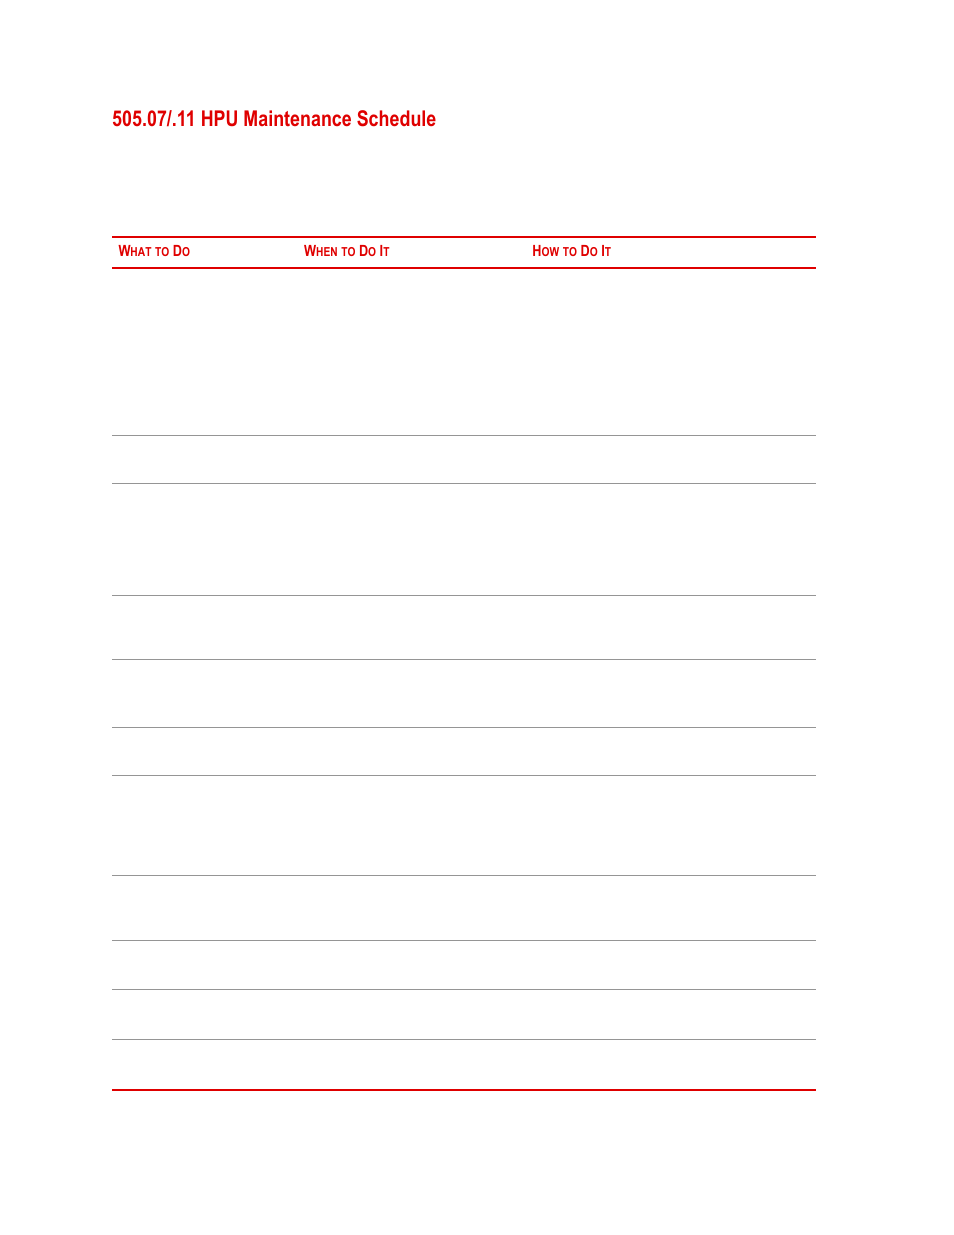 07/.11 hpu maintenance schedule, 07/.11 hpu maintenance schedule 56   MTS  Series 505 SilentFlo Hydraulic Power Unit Model 505-11 User Manual   Page  56 / 90